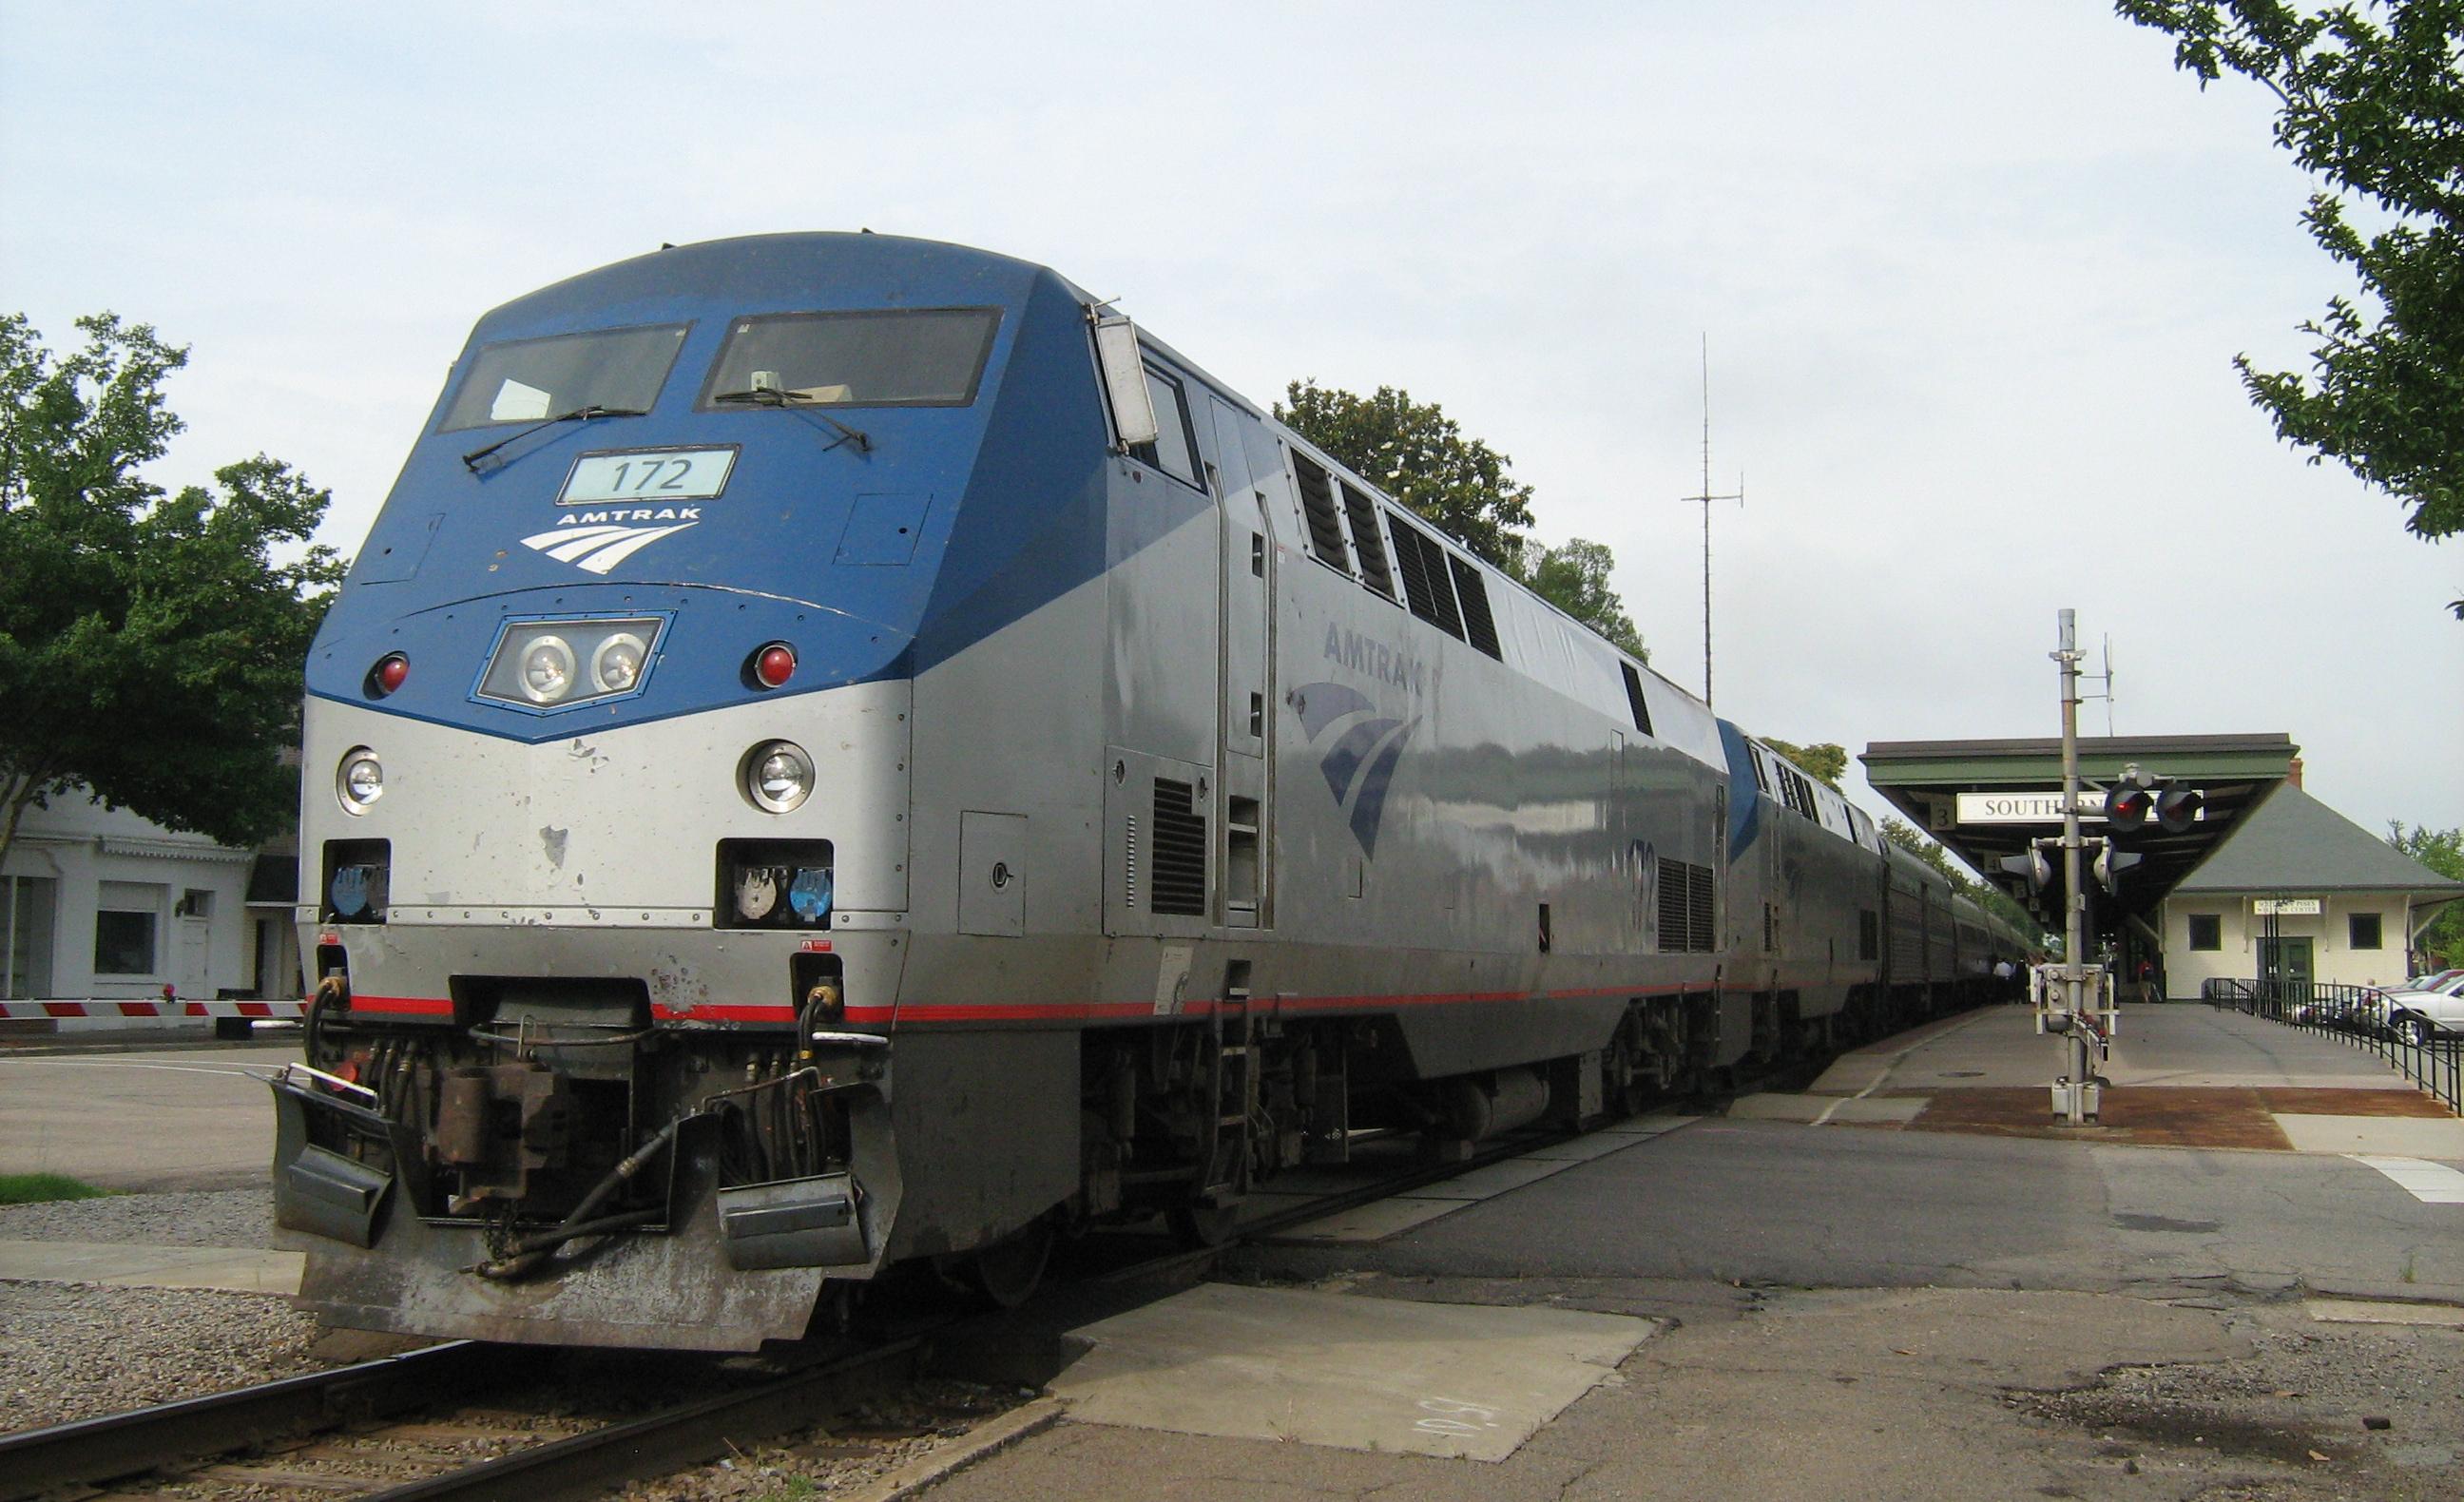 Silver Star (Amtrak train) - Wikipedia